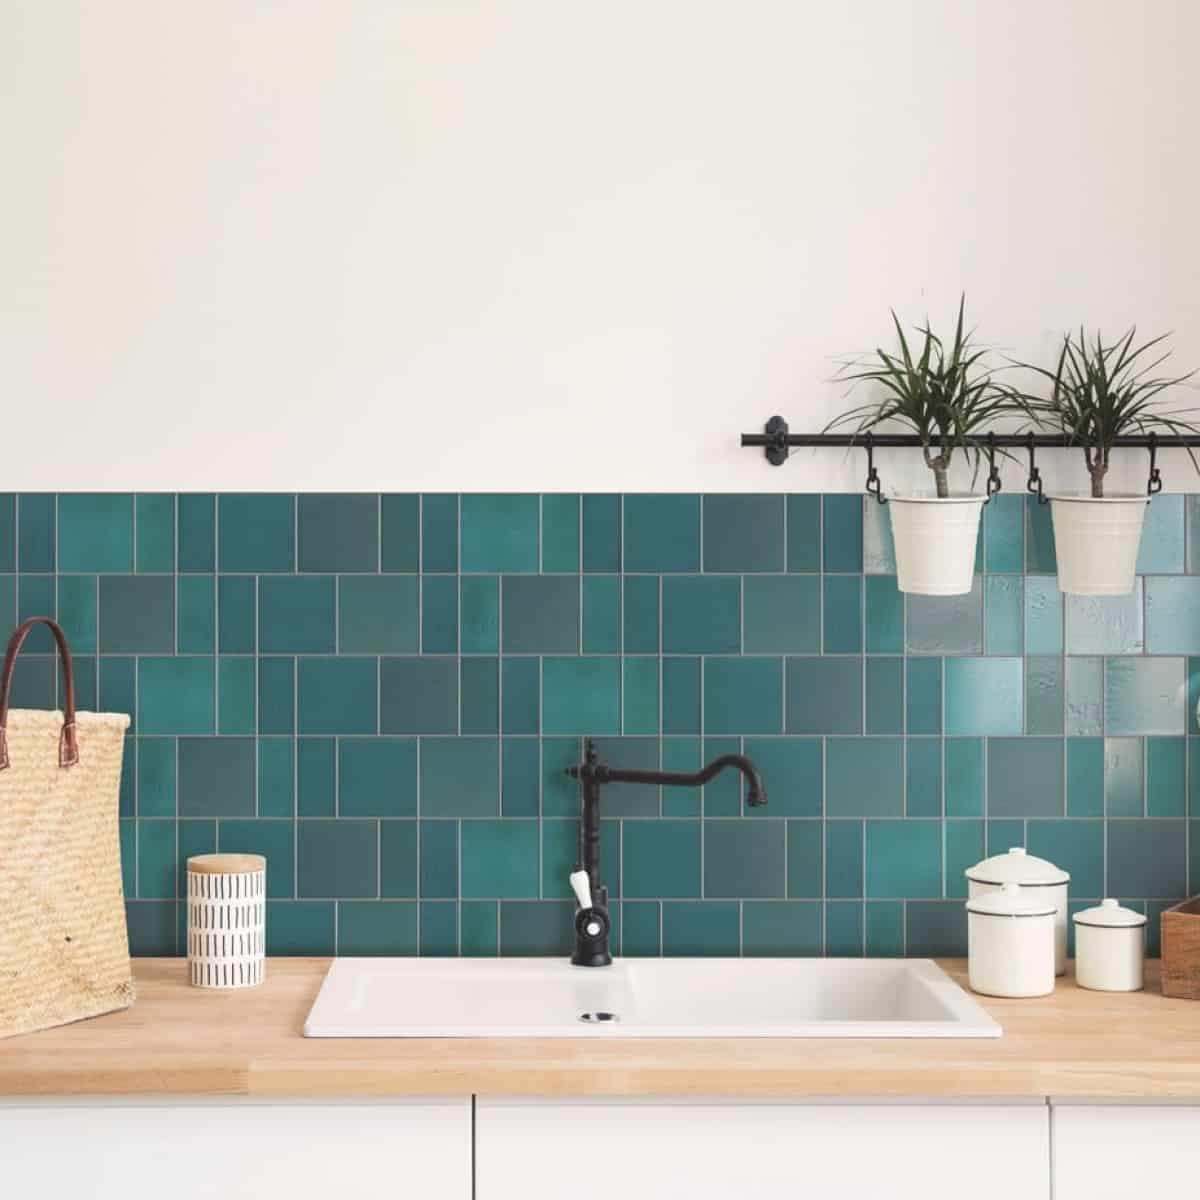 placi ceramice dreptunghiulare de faianta in culoarea verde petrol pentru o bucatarie in tendinte in 2020